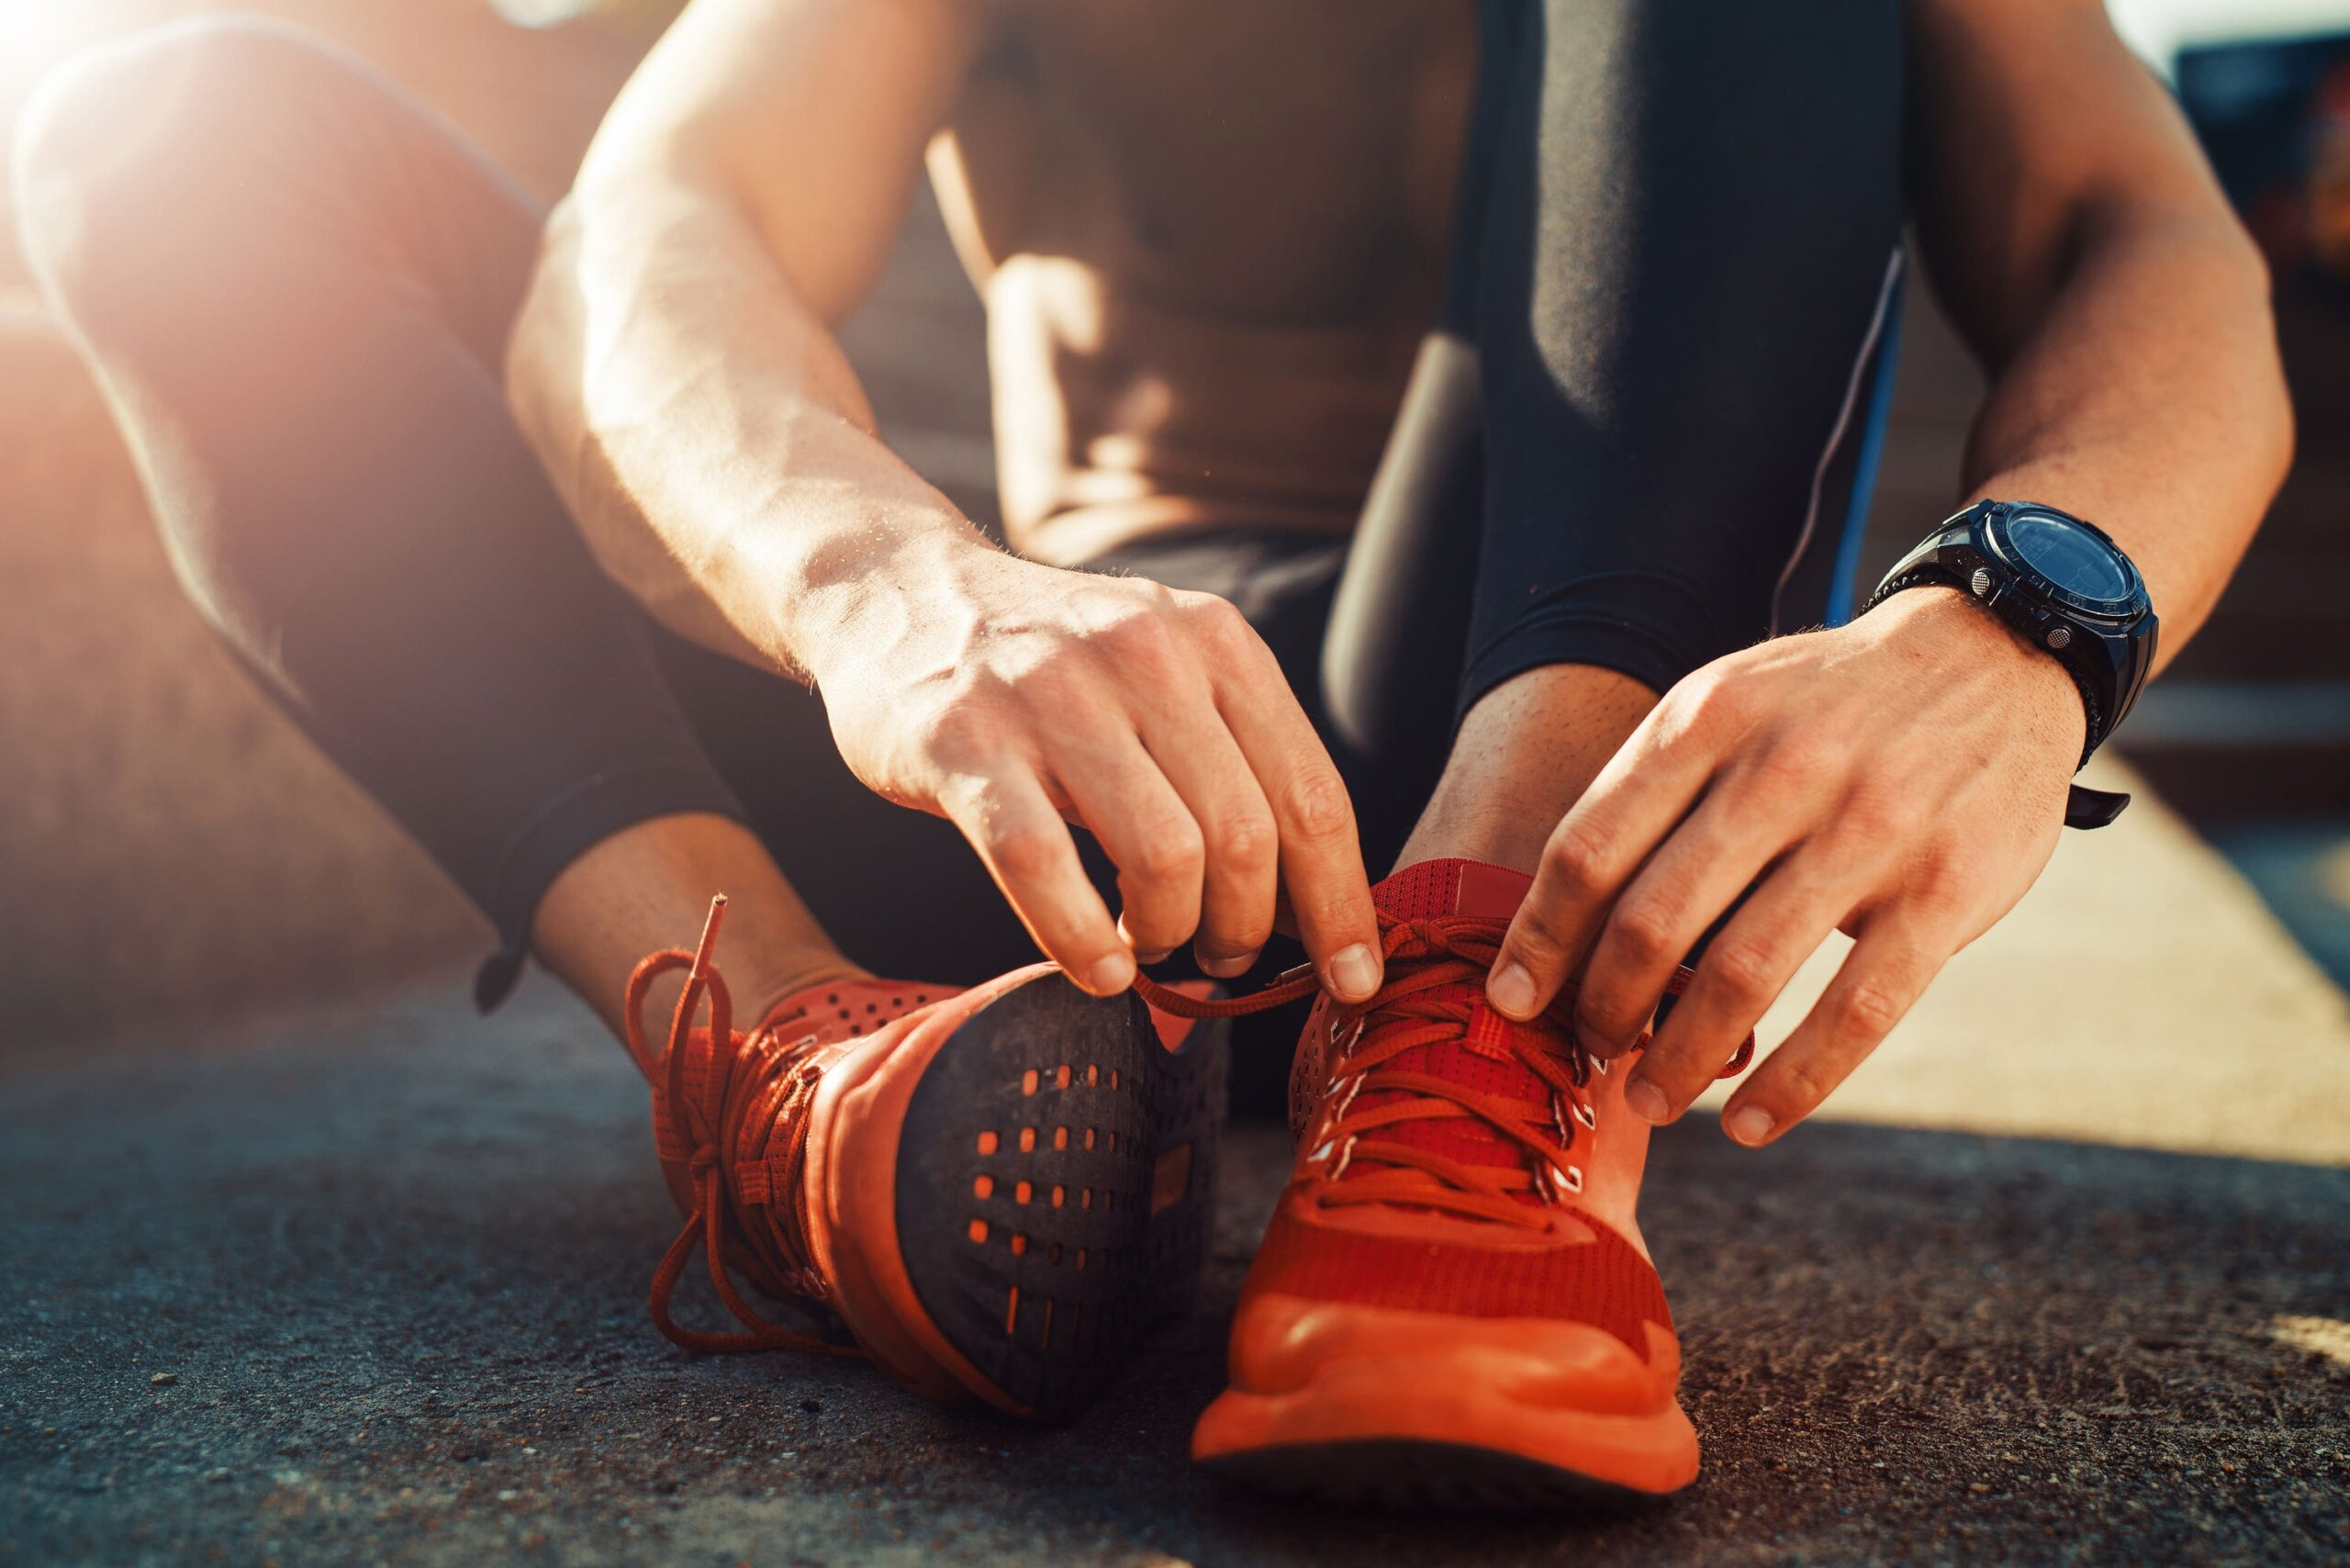 How do i prepare for Running my First Marathon